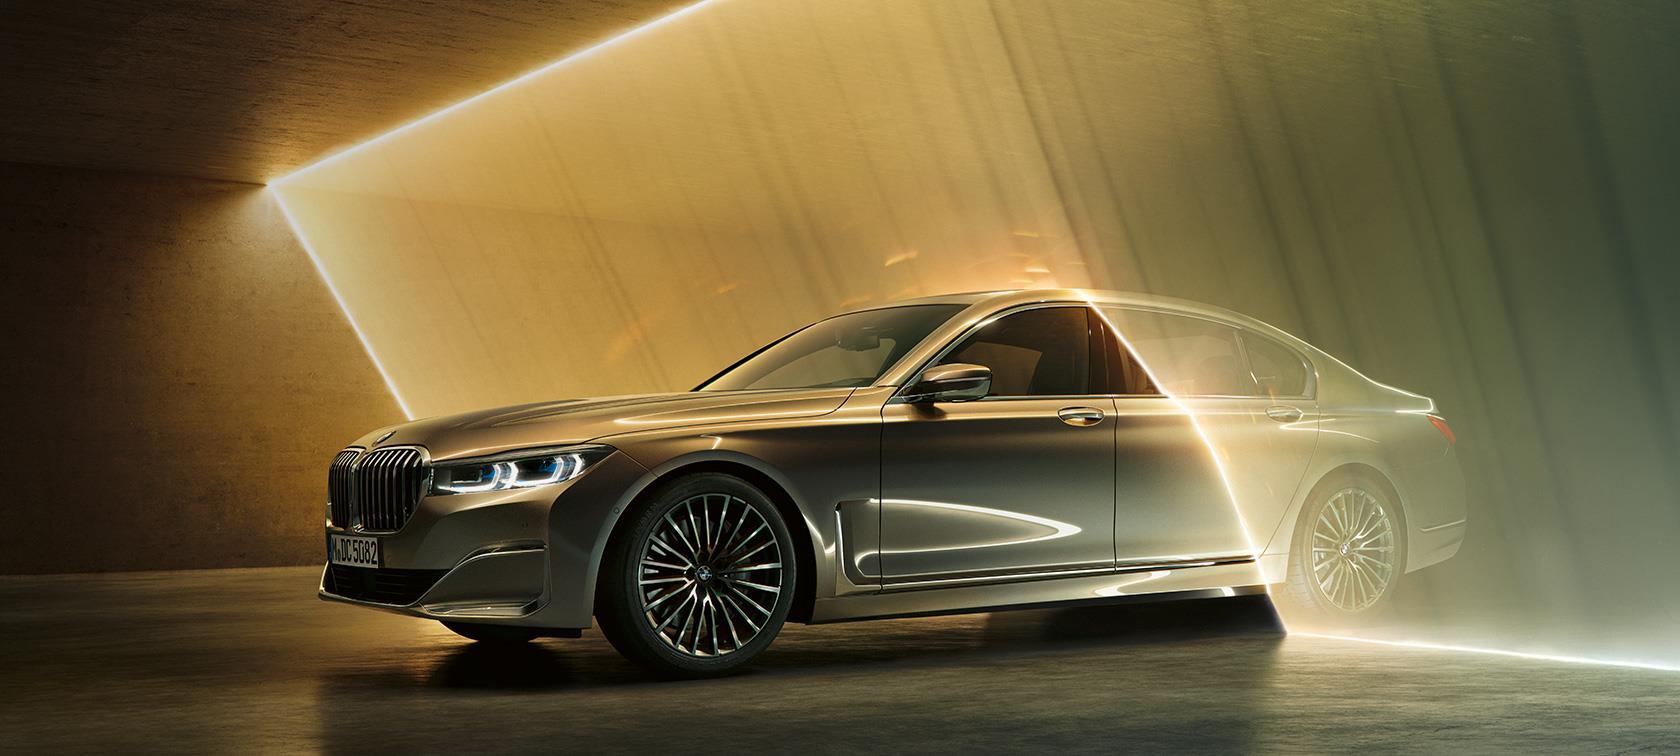 Yeni BMW 7 Serisi Sedan